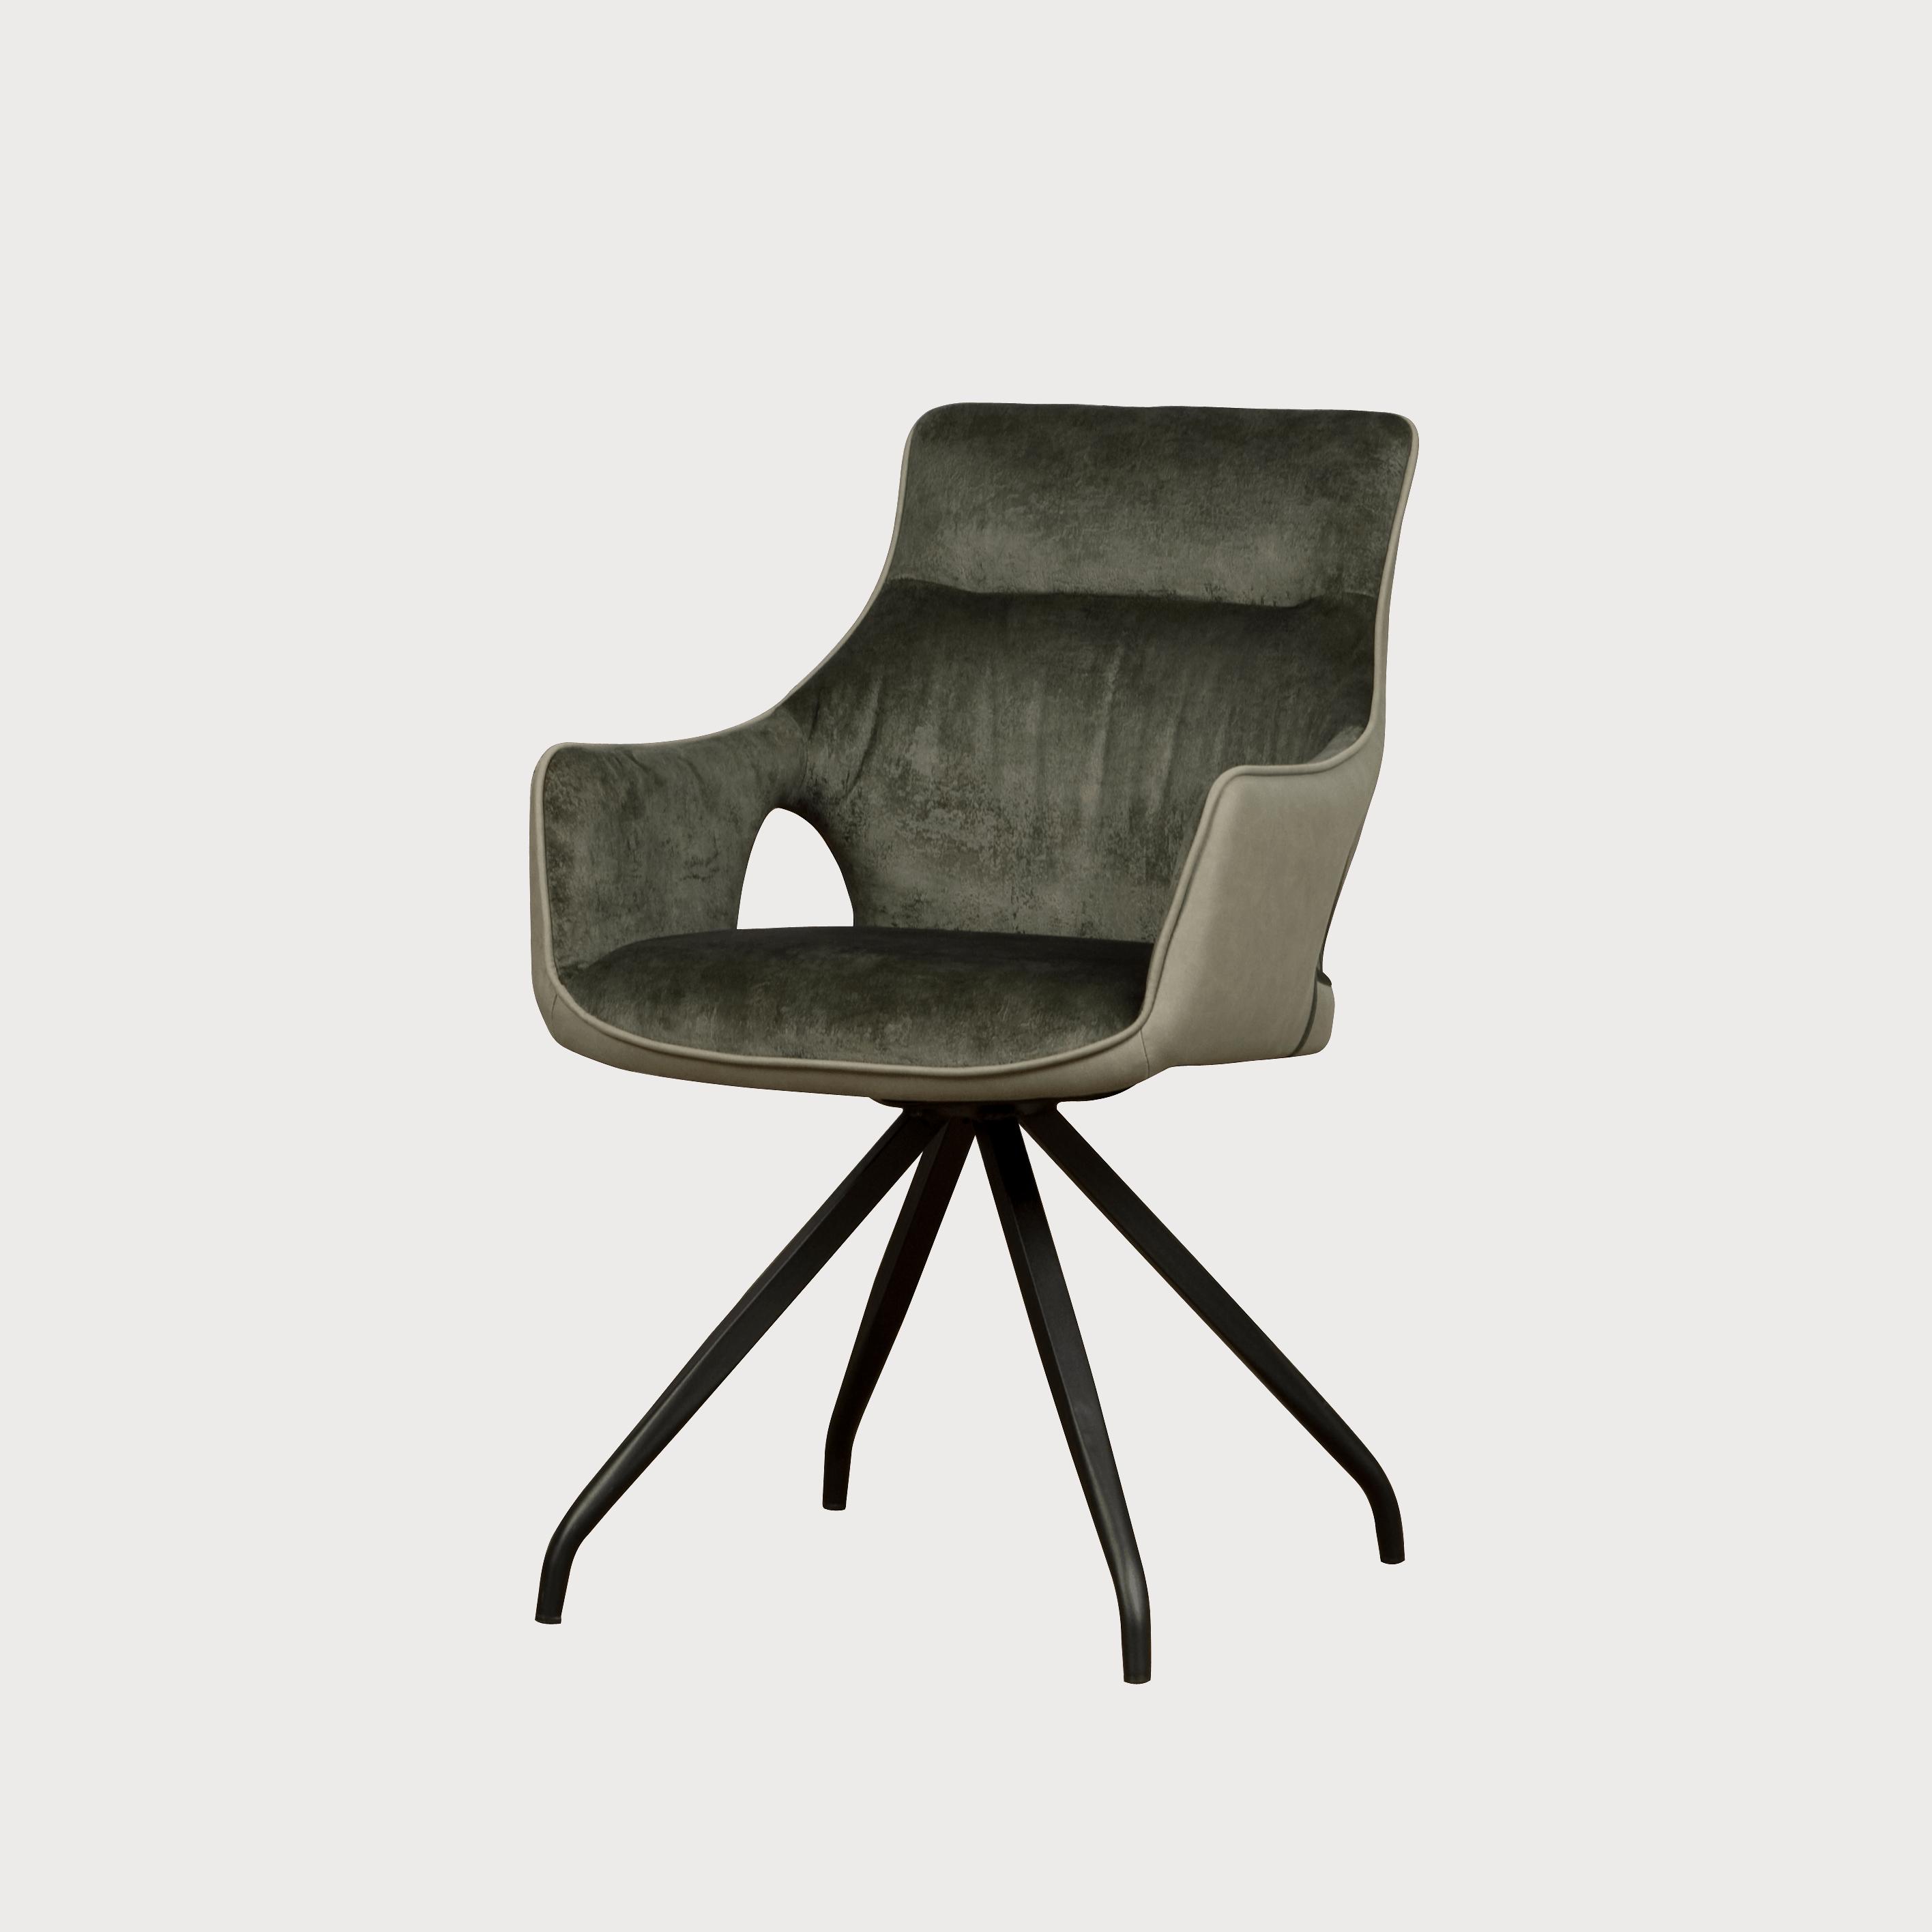 Stoel - Eetkamerstoelen - Nola swivel armchair - green velvet 8196-20 / fabric 7501-6